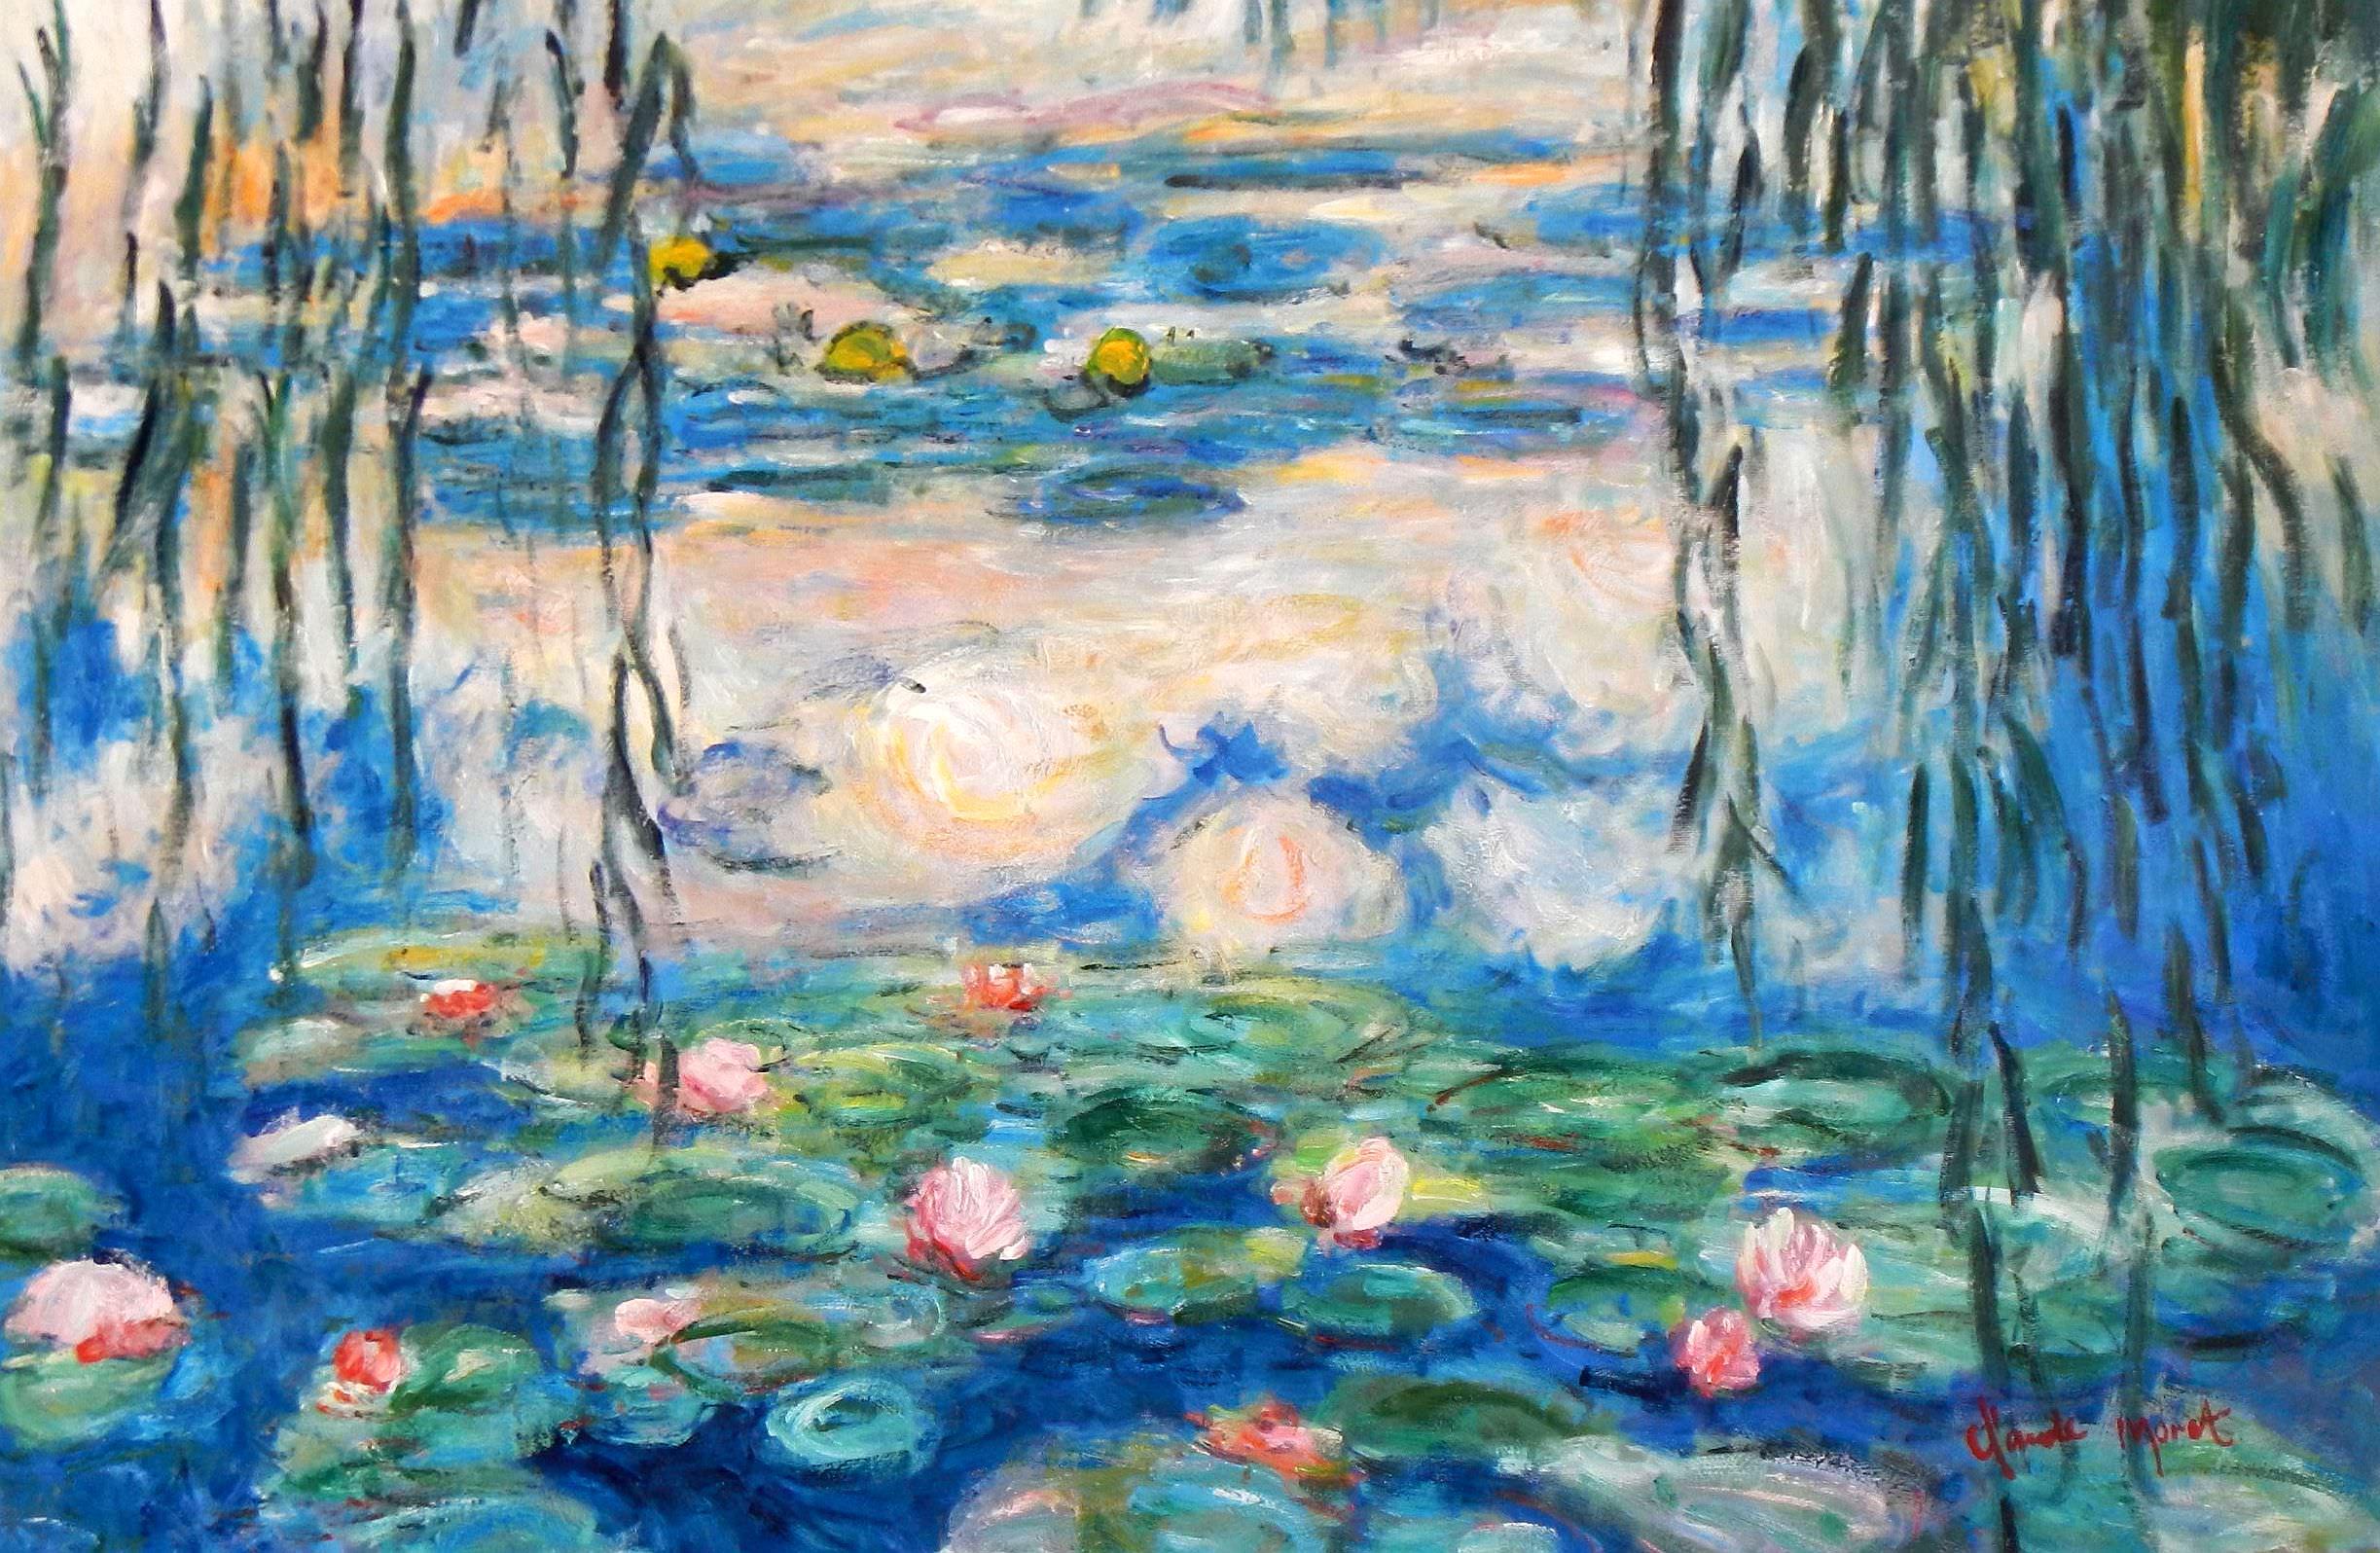 Claude Monet - Seerosen & Weiden d93945 60x90cm Ölbild handgemalt